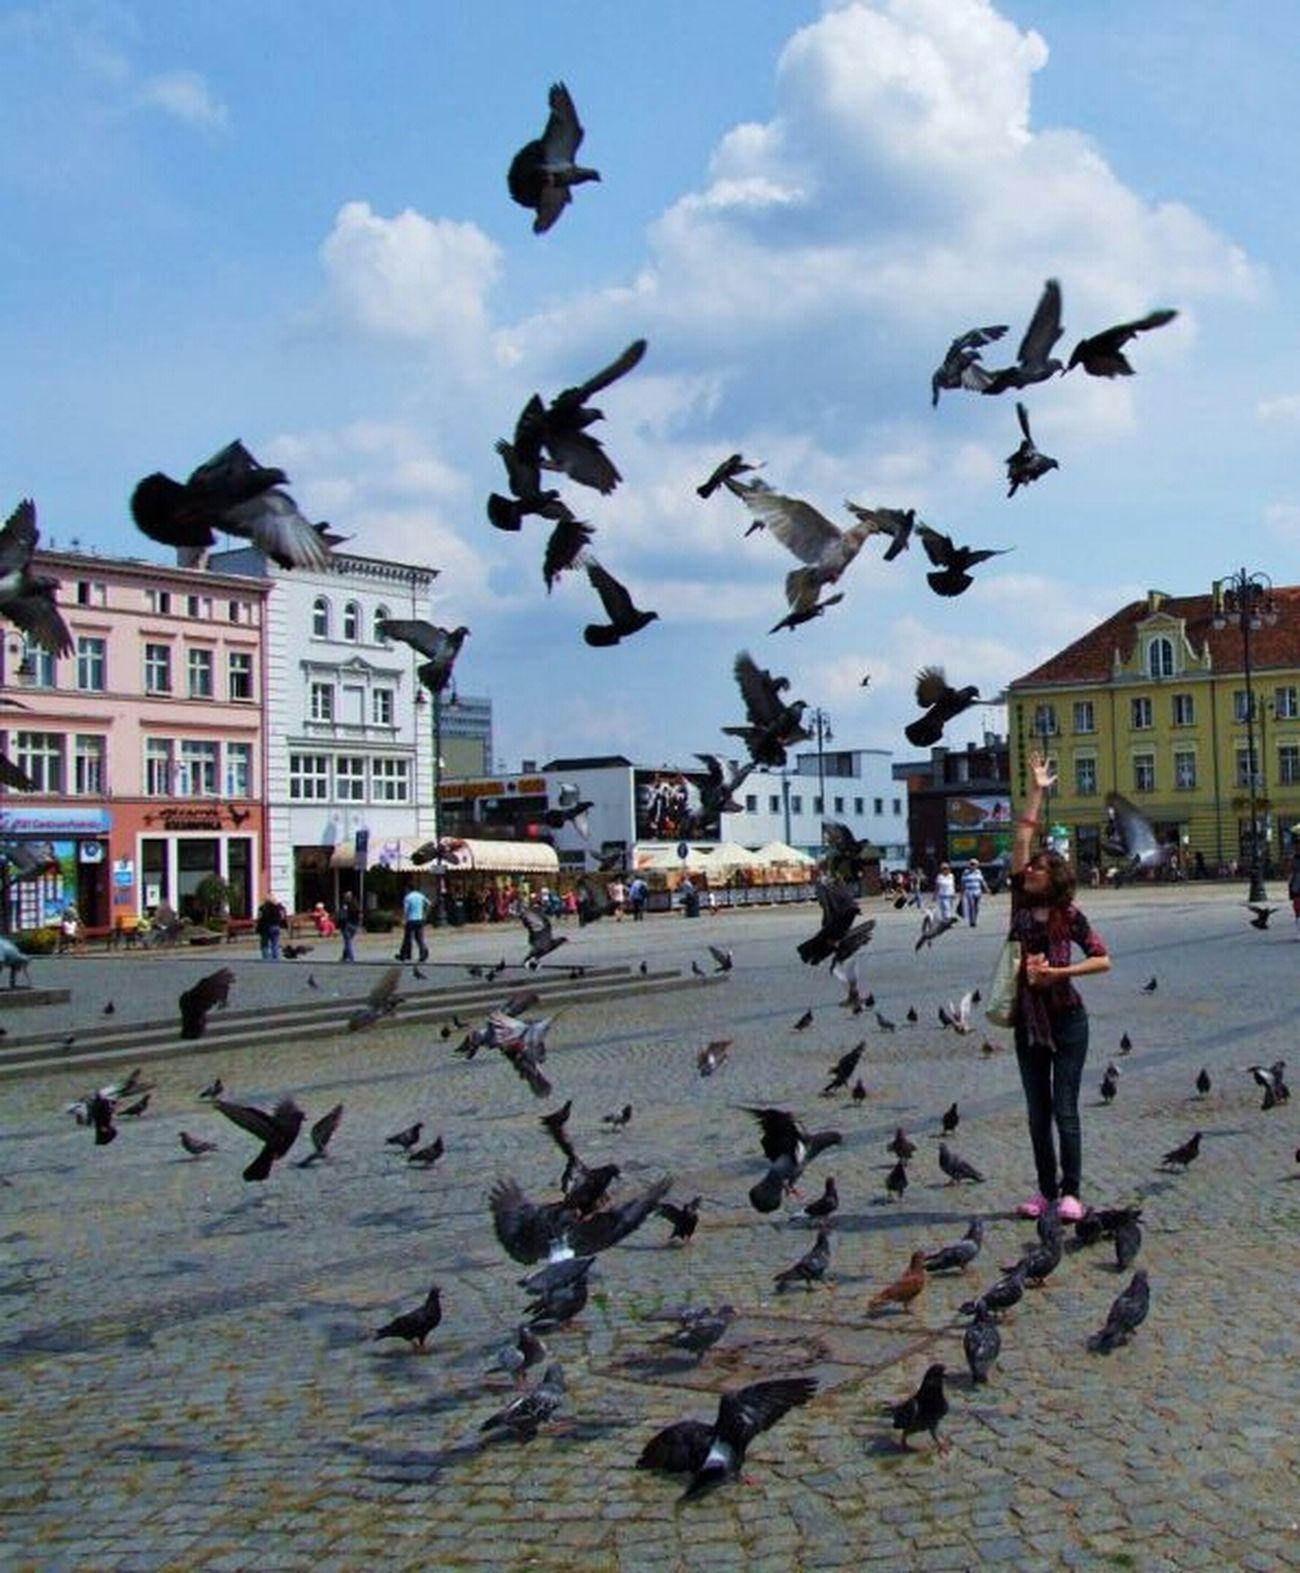 feeding pigeons... Urban Birds Taking Photos Birds Nature_collection Bydgoszcz EyeEm Birds Life In Motion Cityworldwide Hanging Out